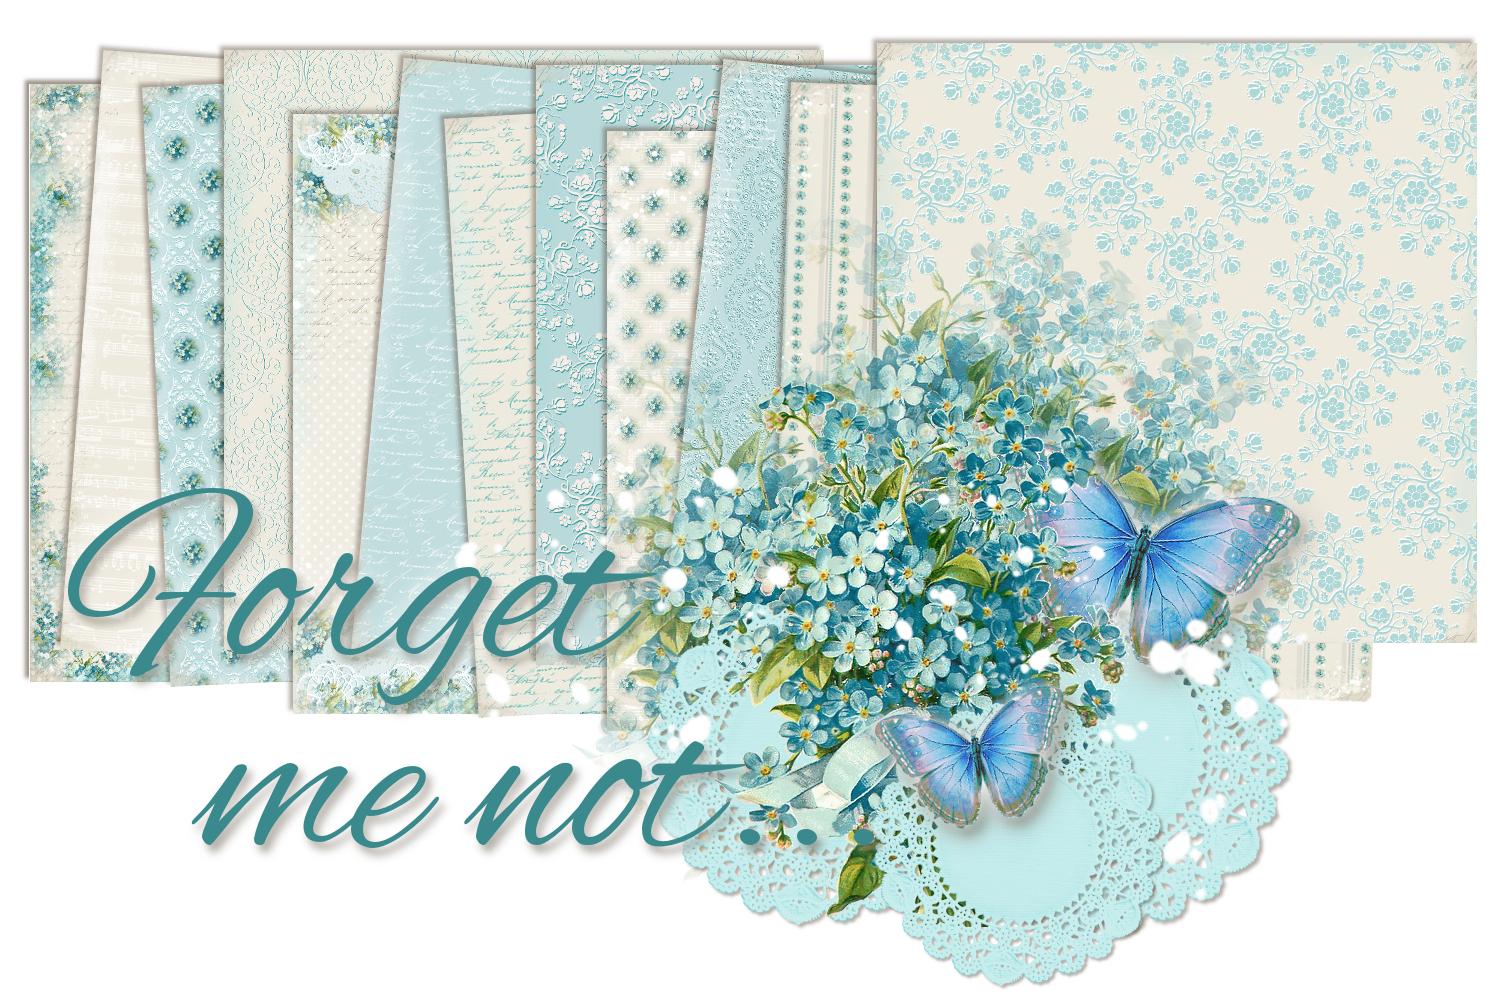 http://blog.lemoncraft.pl/2014/06/nie-zapomnij-mnie-forget-me-not.html